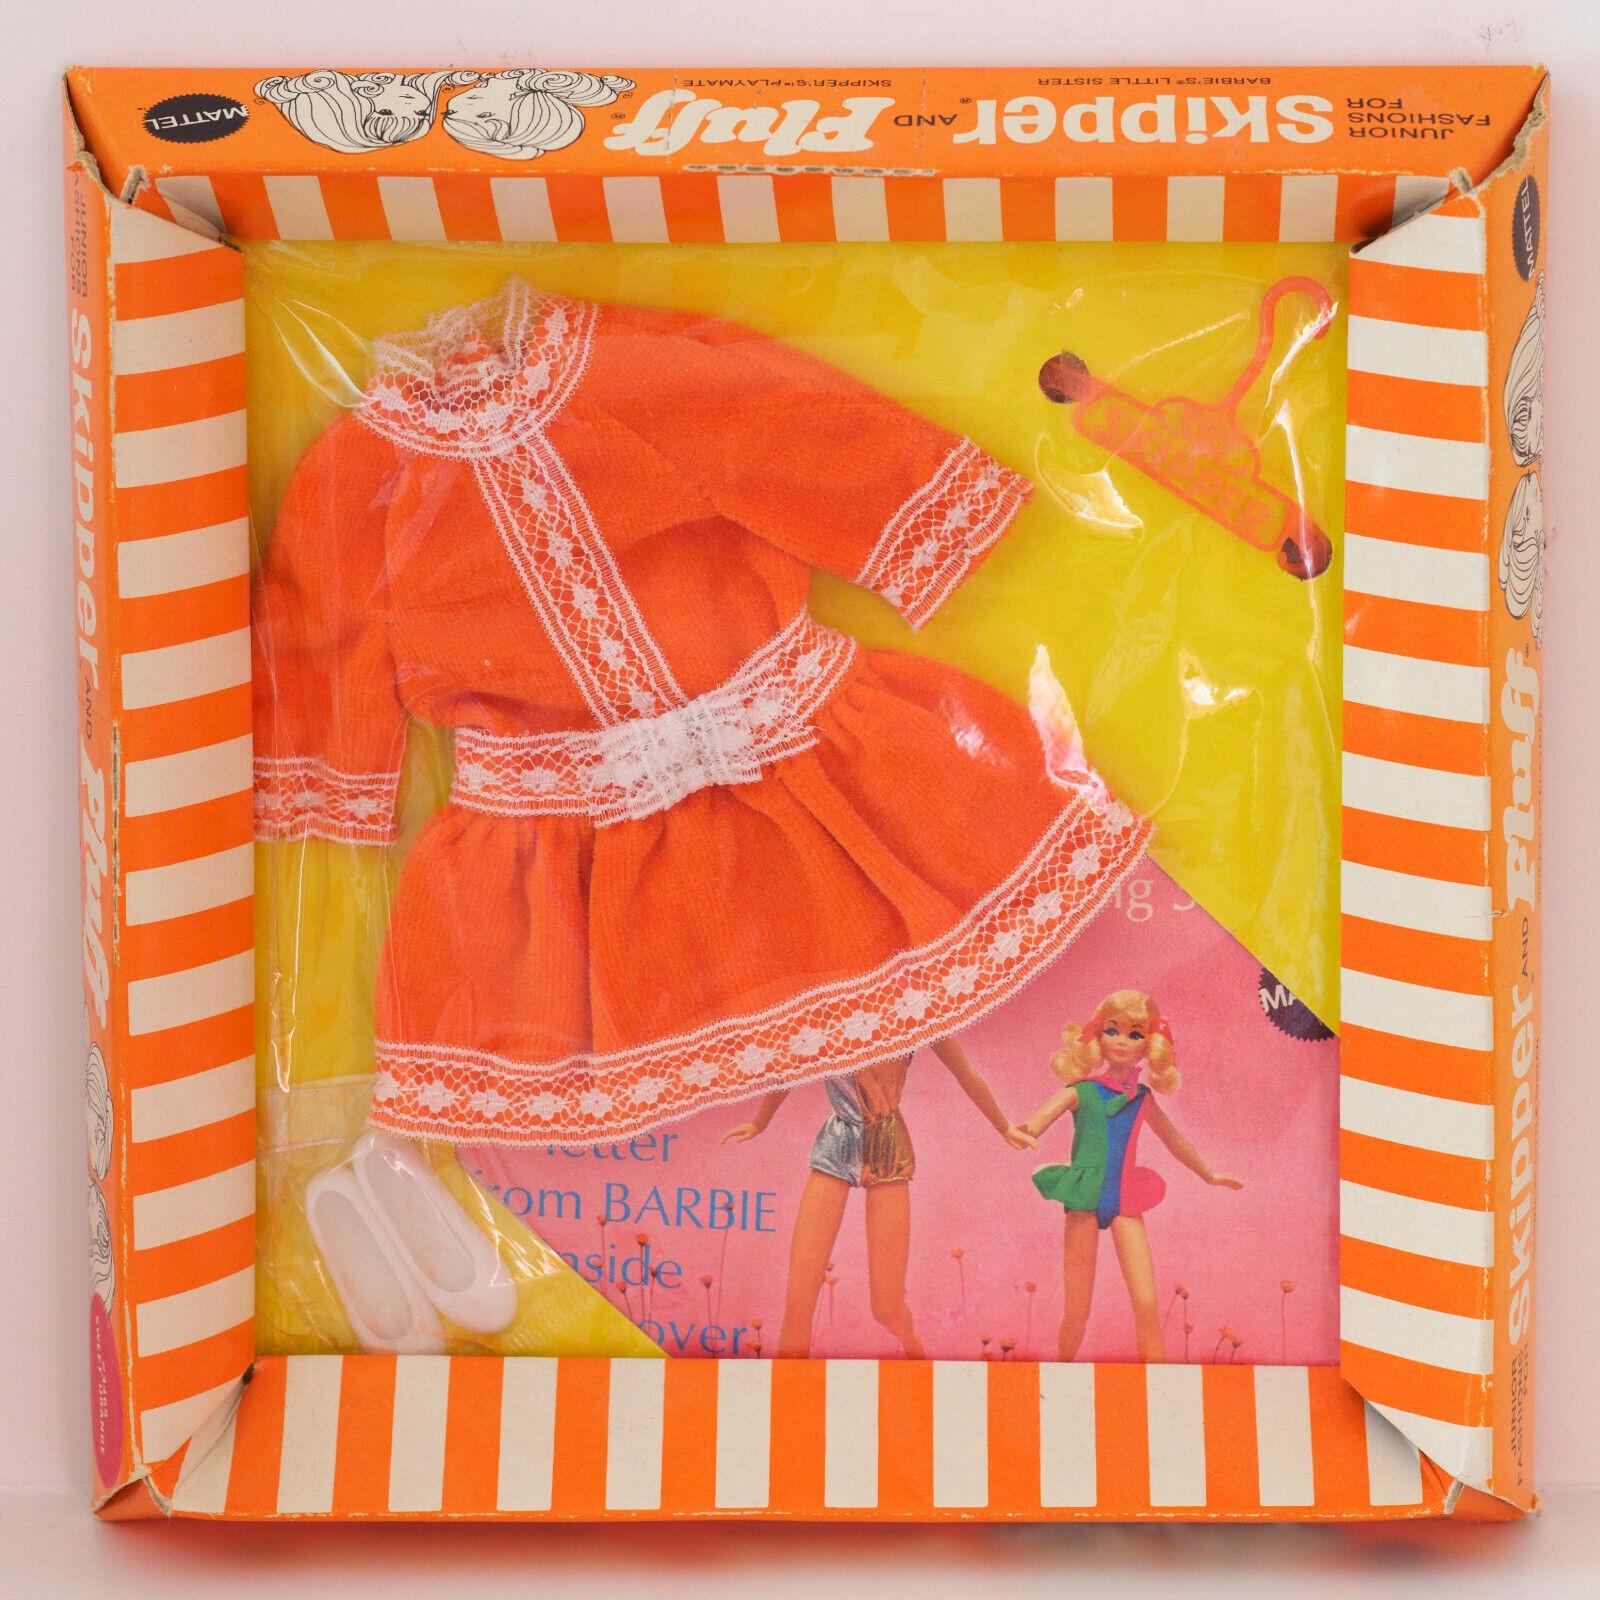 MINT NRFB SKIPPER FASHION  3465  SWEET Orange  Fashion MOC MIB Mattel Vintage